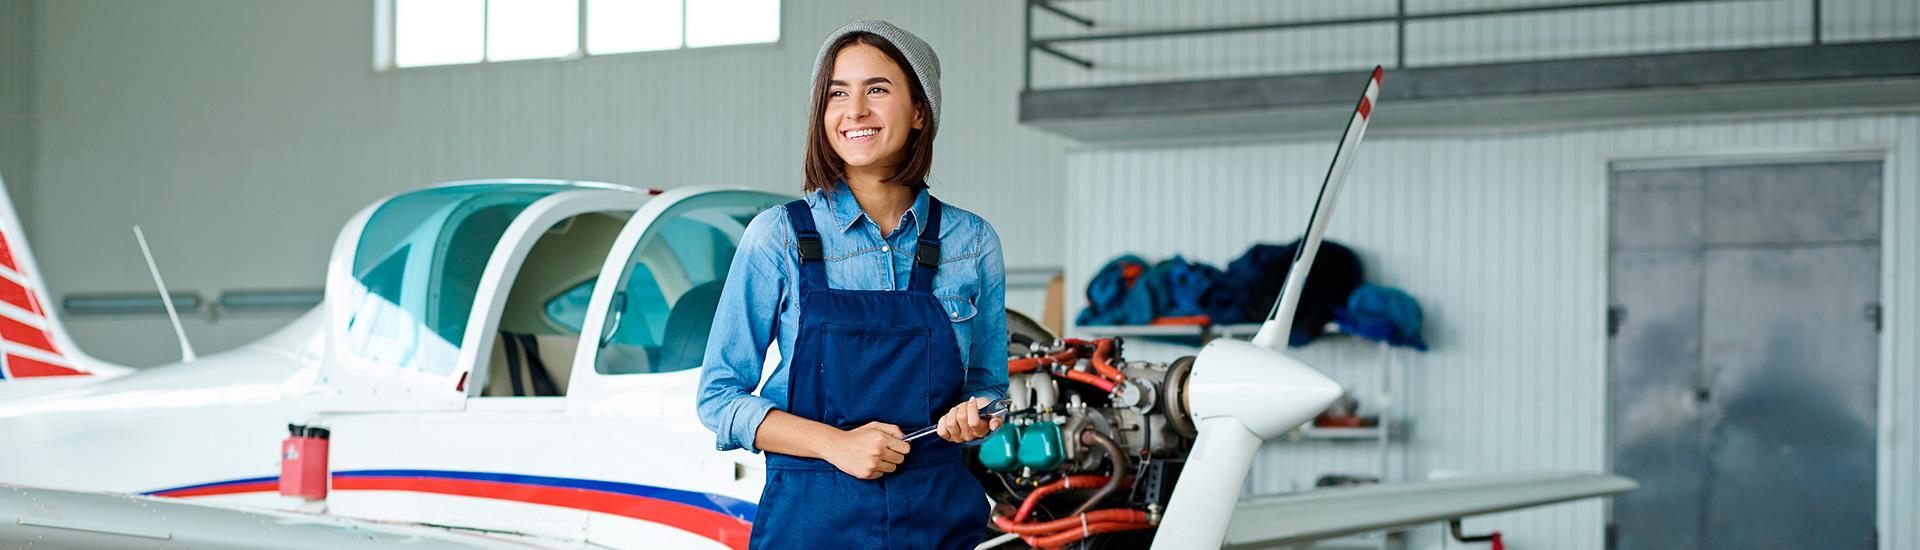 young female aviation mechanic